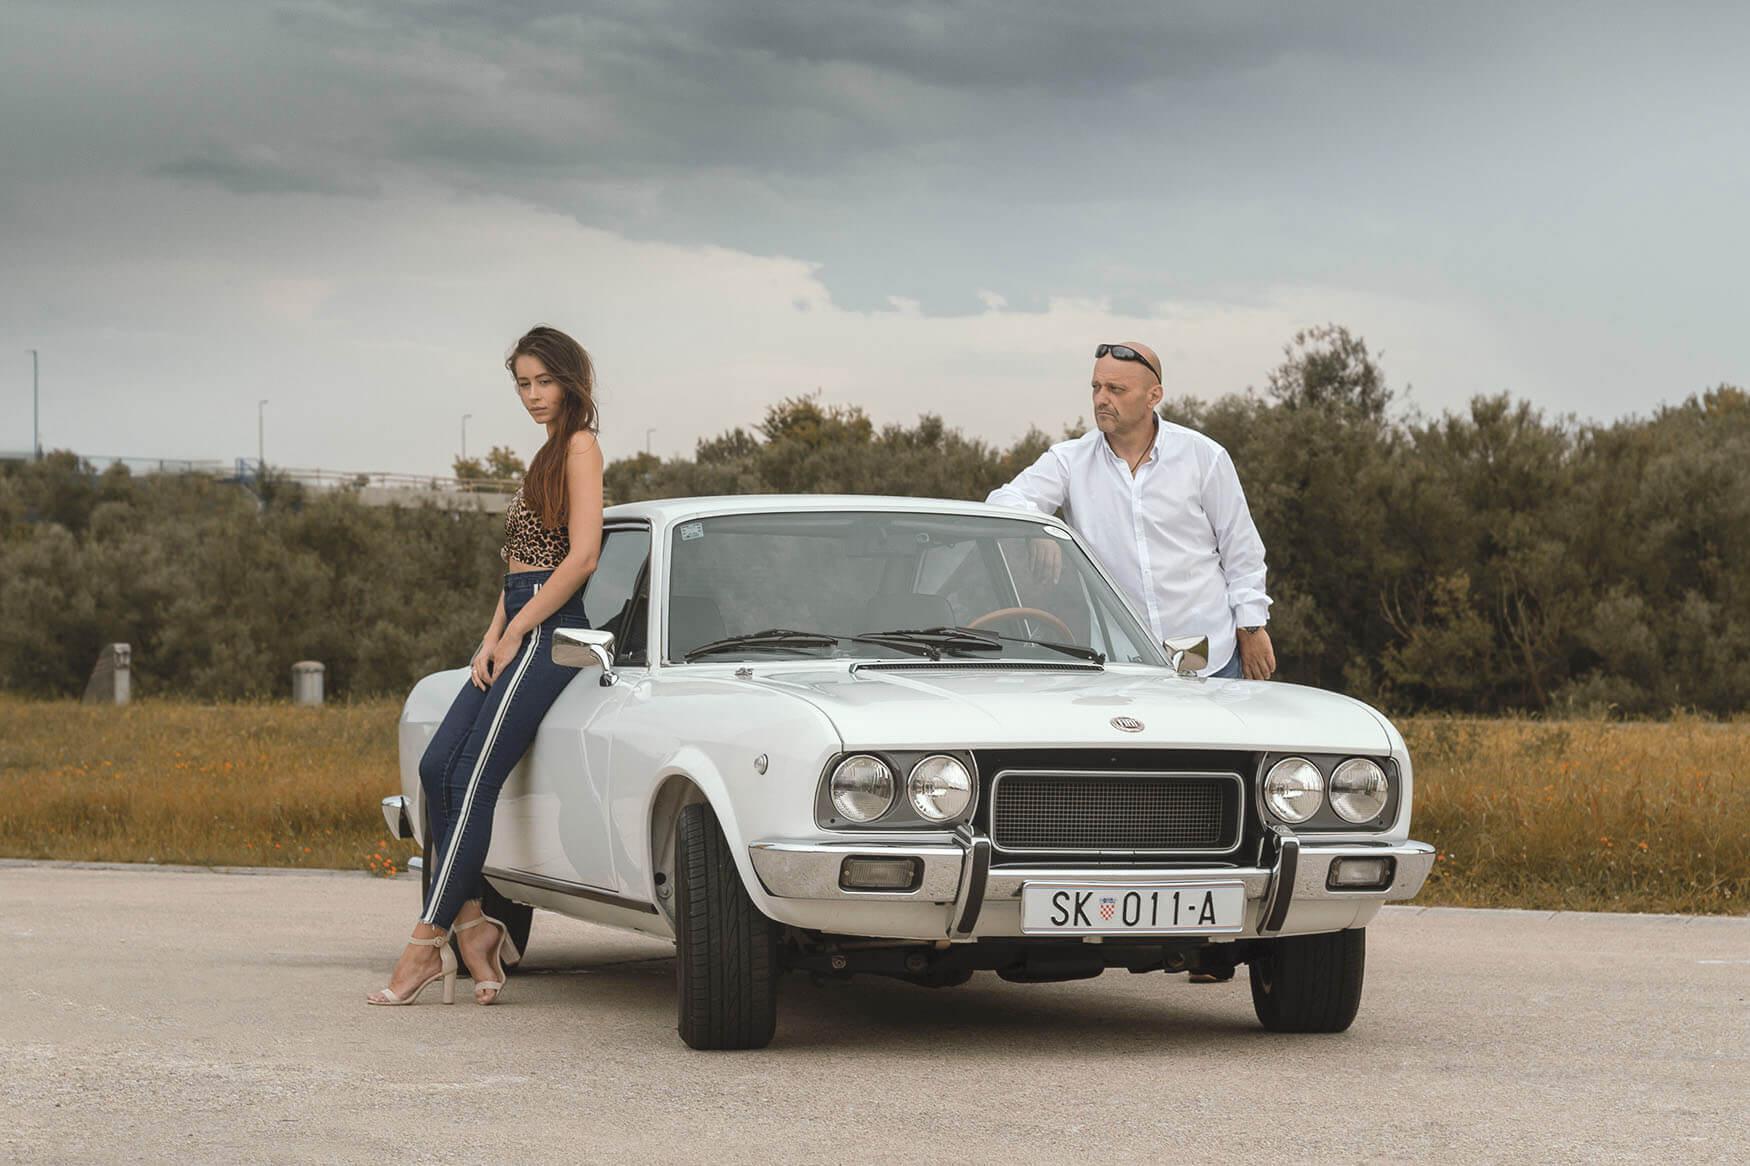 Autor-Kristina-Matijaš-fotoshooting-Fotoklub-Sisak